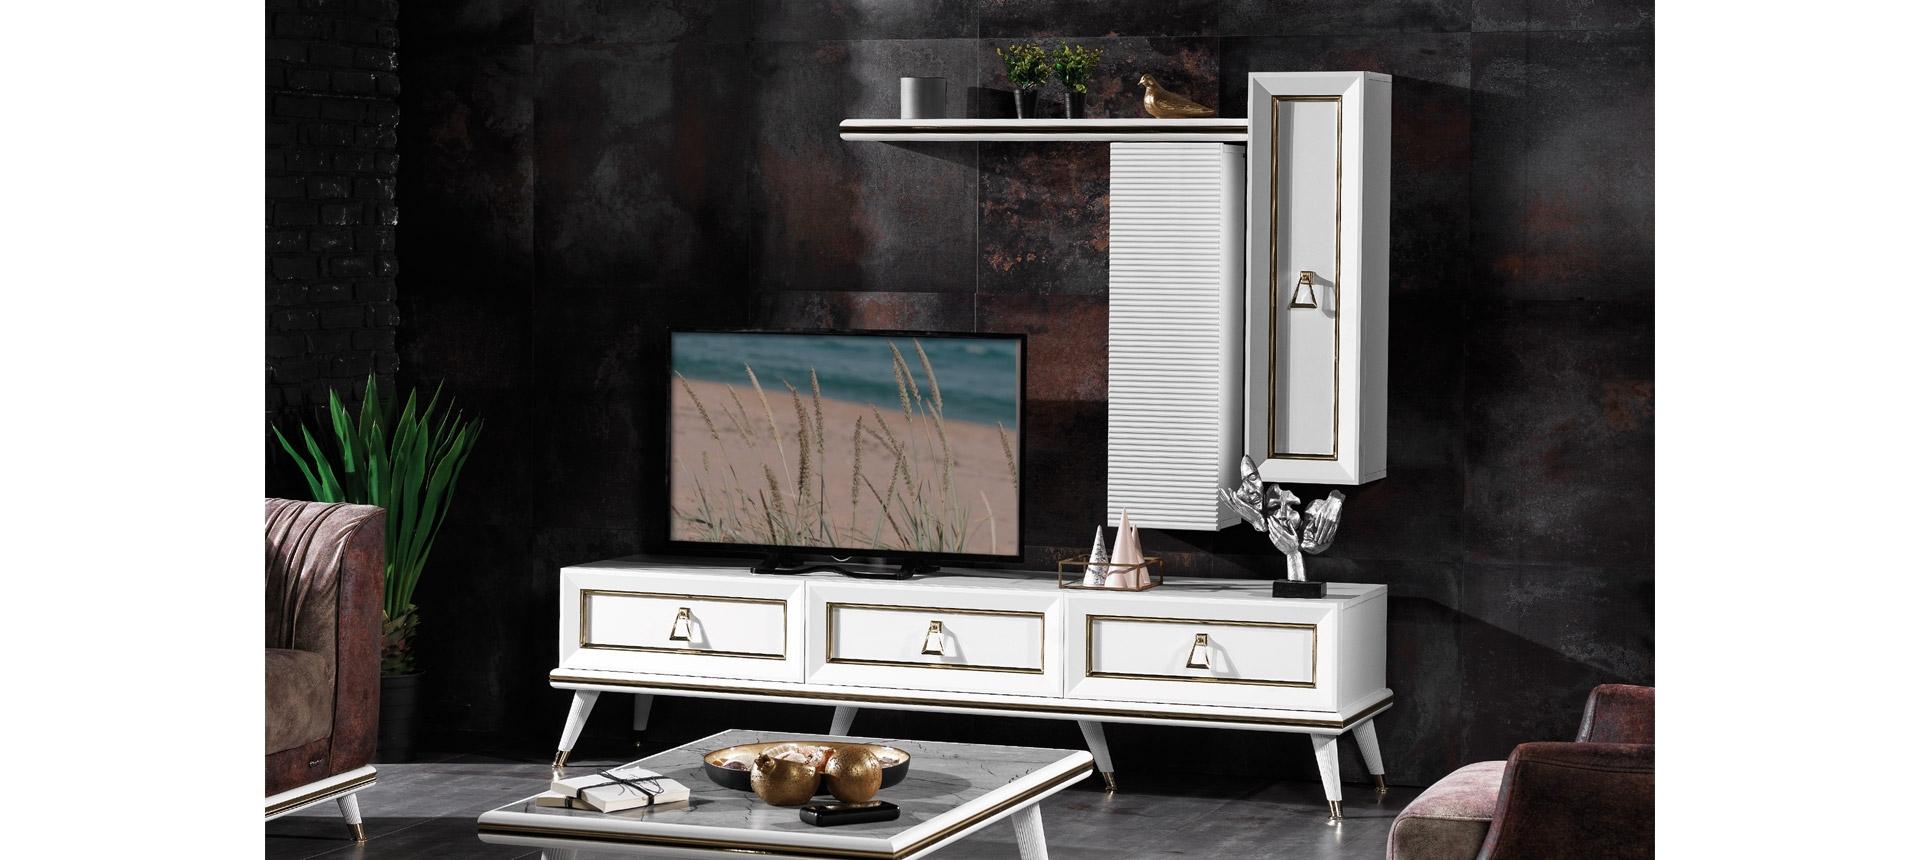 Comoda TV din pal si metal, cu 3 sertare Toscana Alb / Auriu, l203xA50xH50 cm imagine